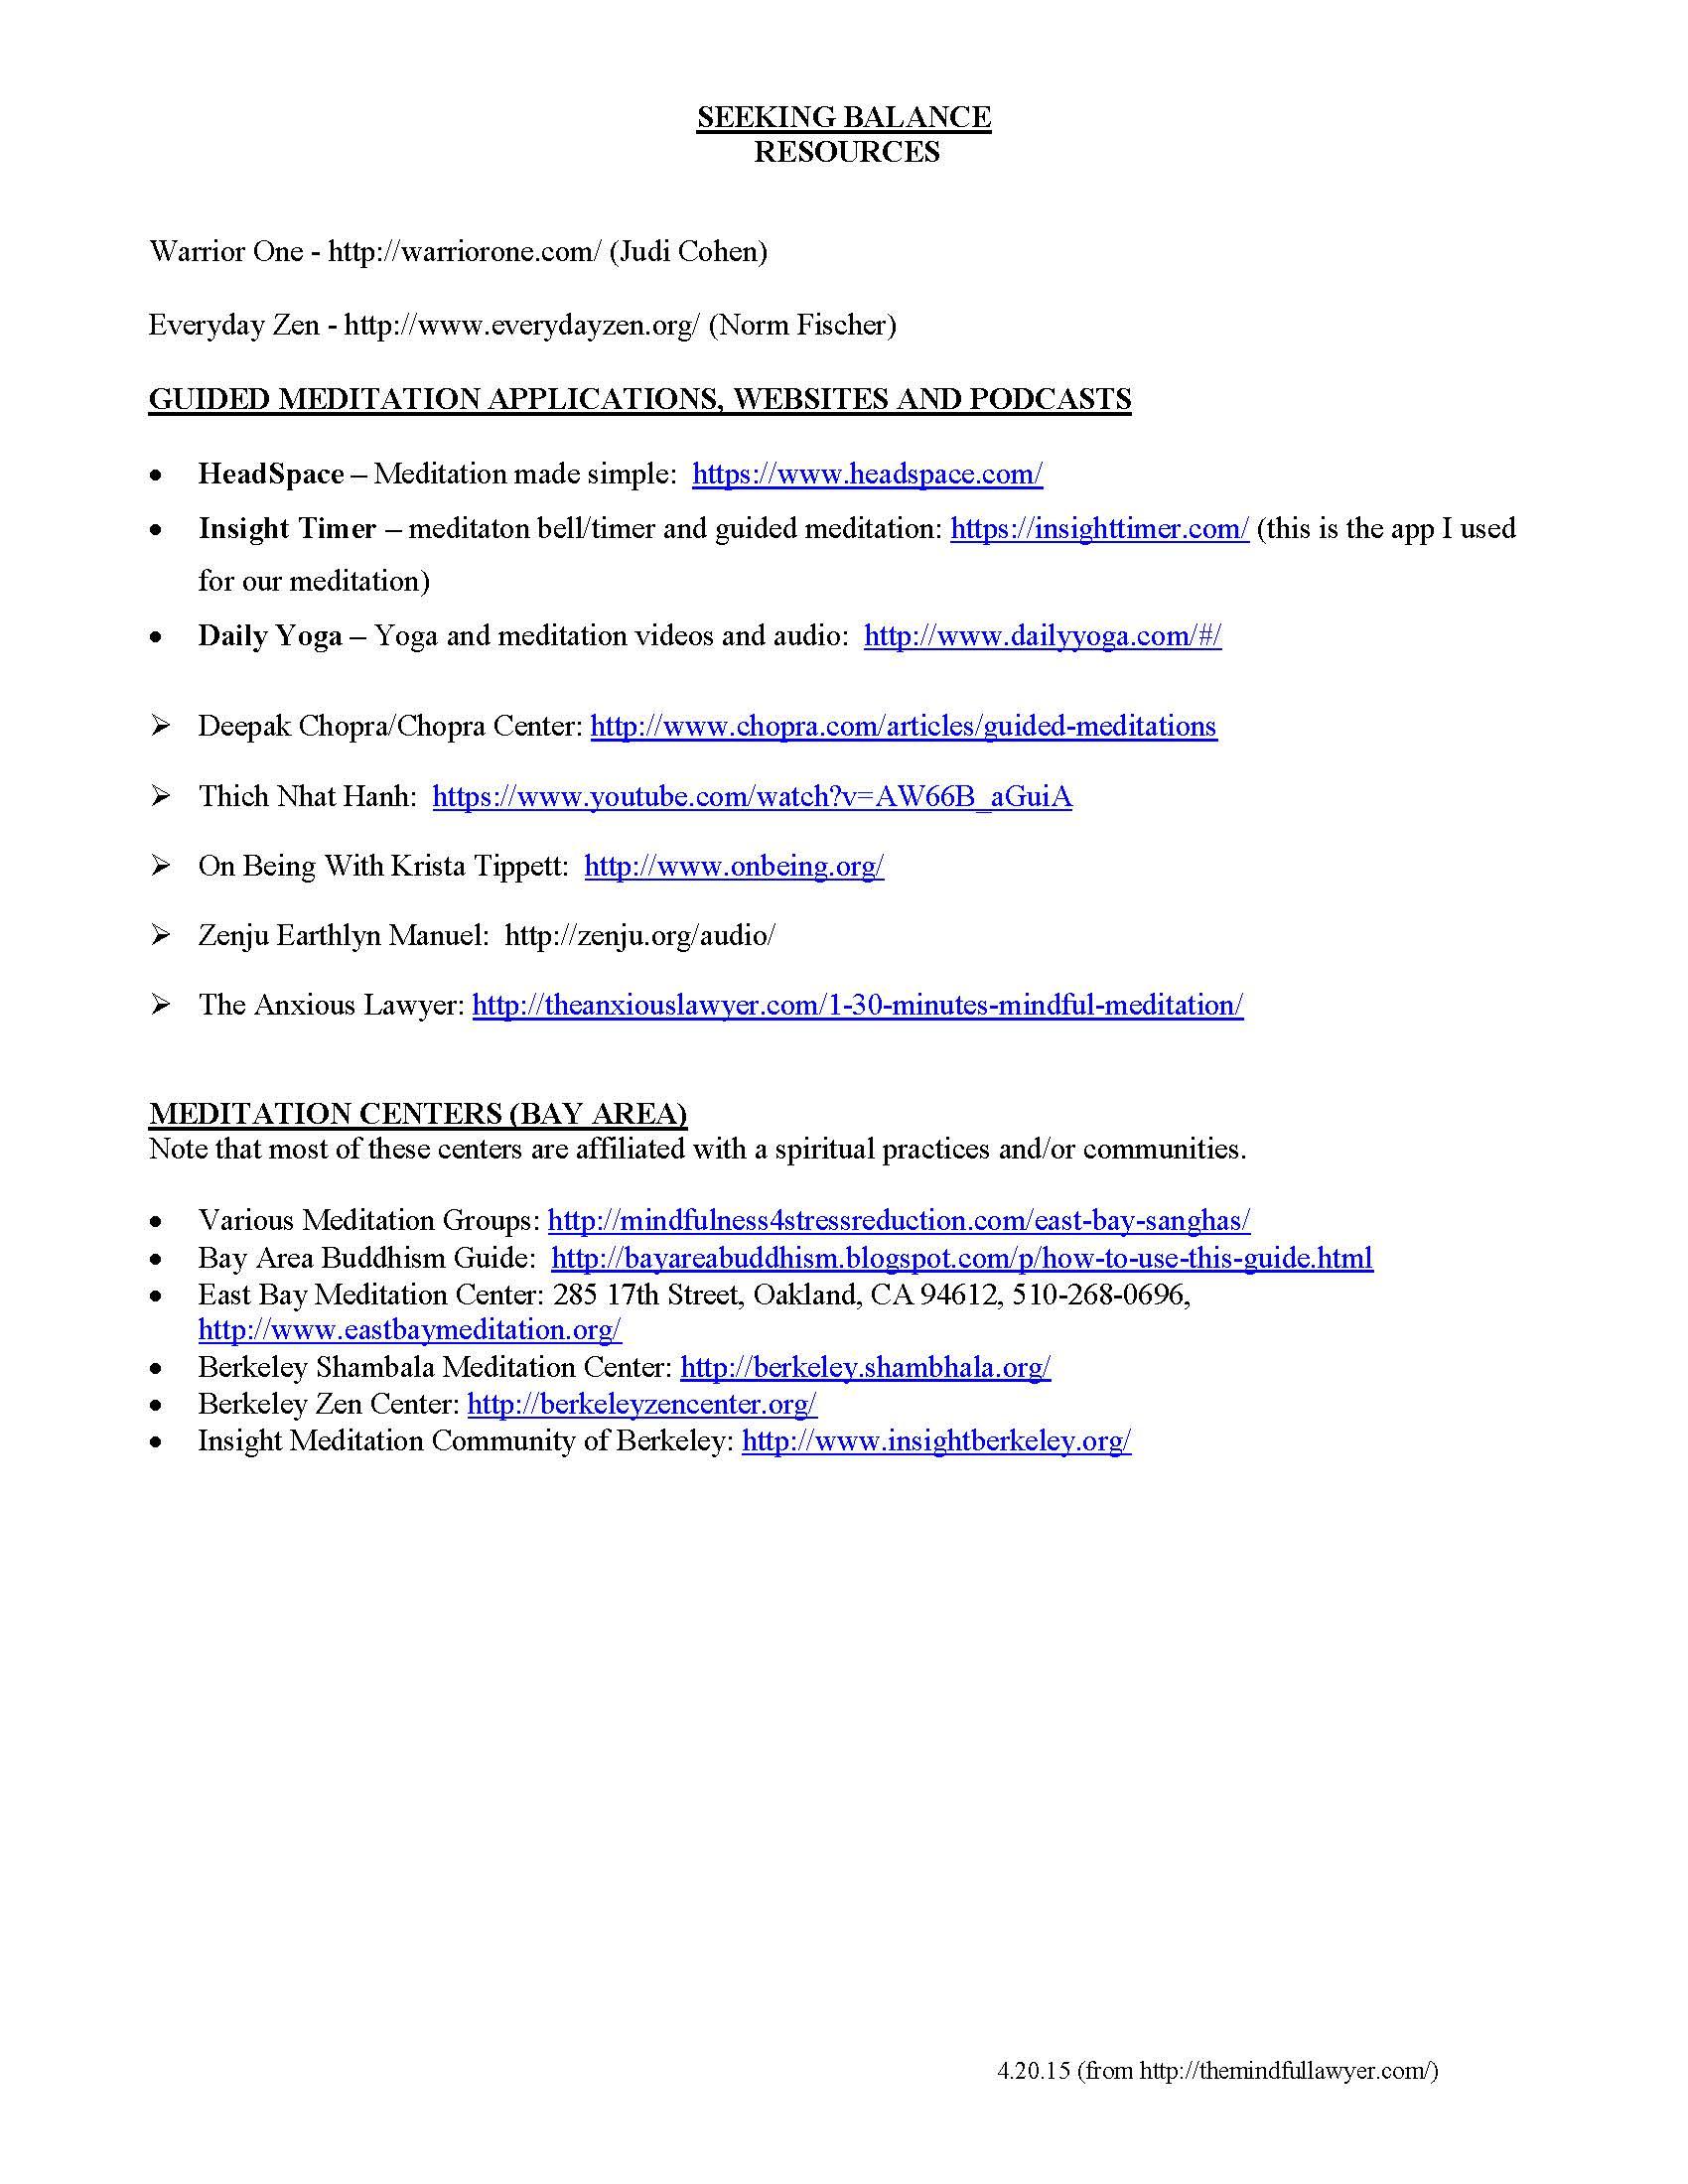 SEEKINGBALANCERESOURCES9.20.17_Page_2.jpg